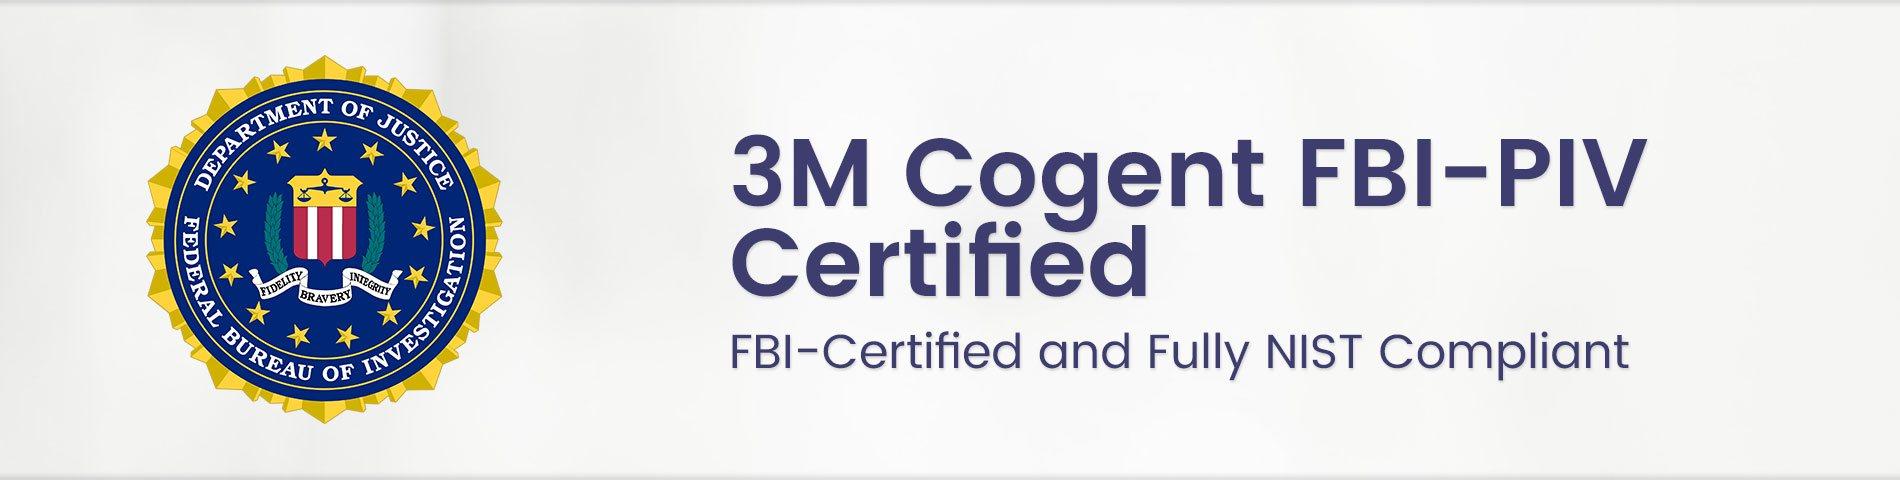 Fbi certified biometric identification idsoftware fbi certification xflitez Choice Image